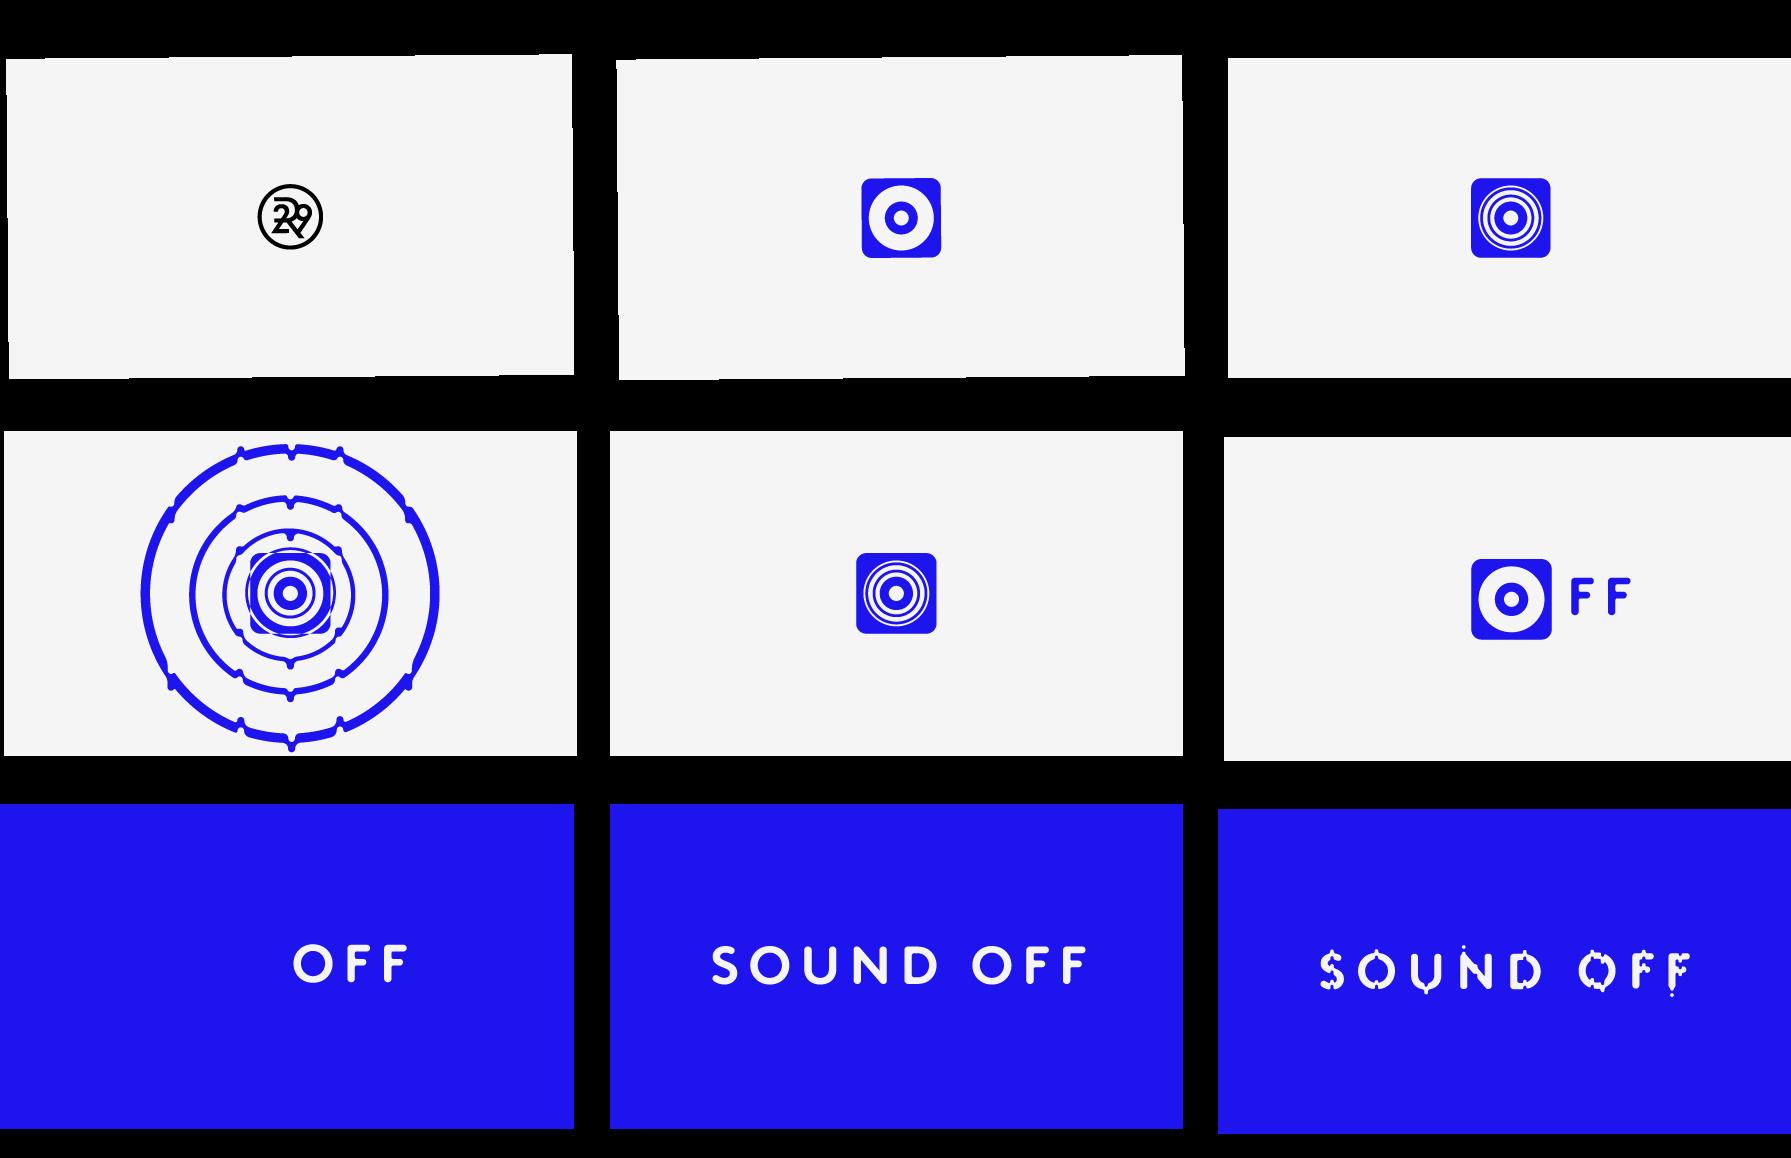 SoundOff_LogoGuide_r1.png